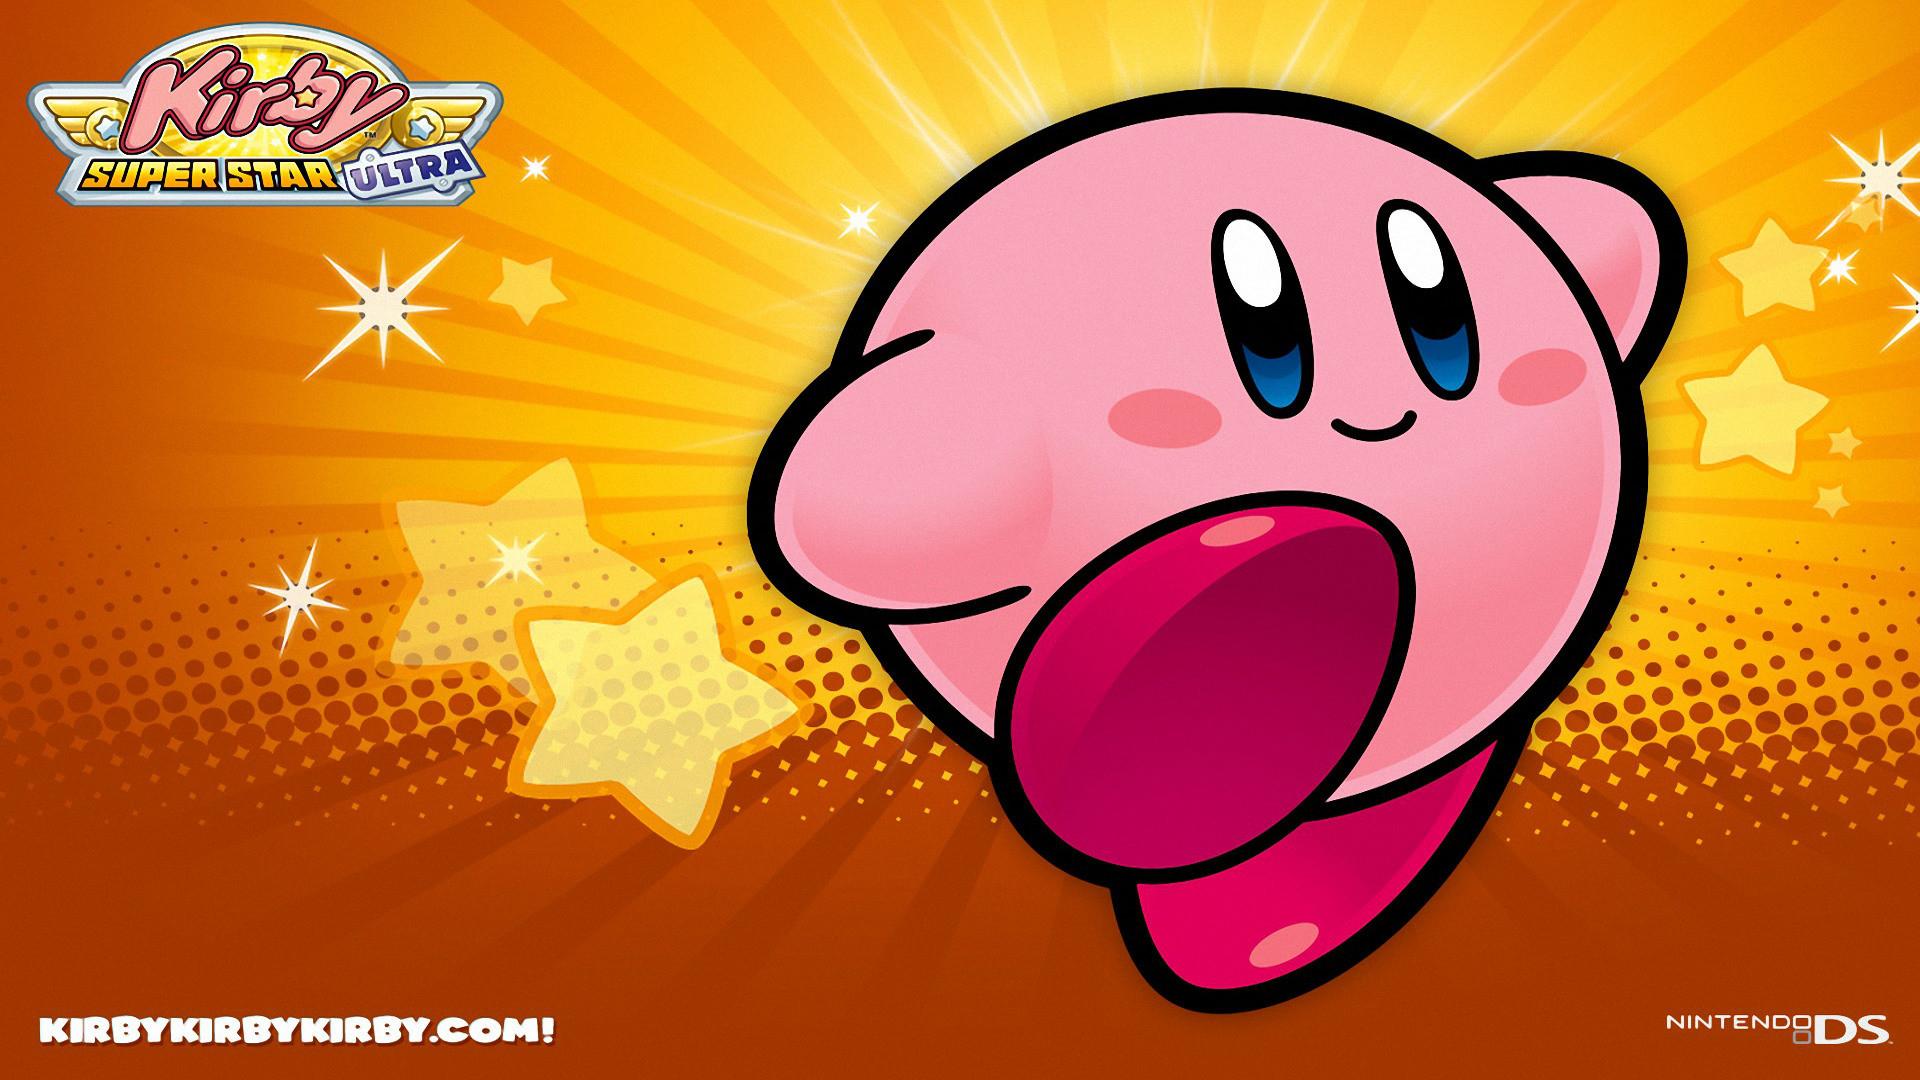 Alpha Coders Wallpaper Abyss Videojuego Kirby: Super Star Ultra 594131